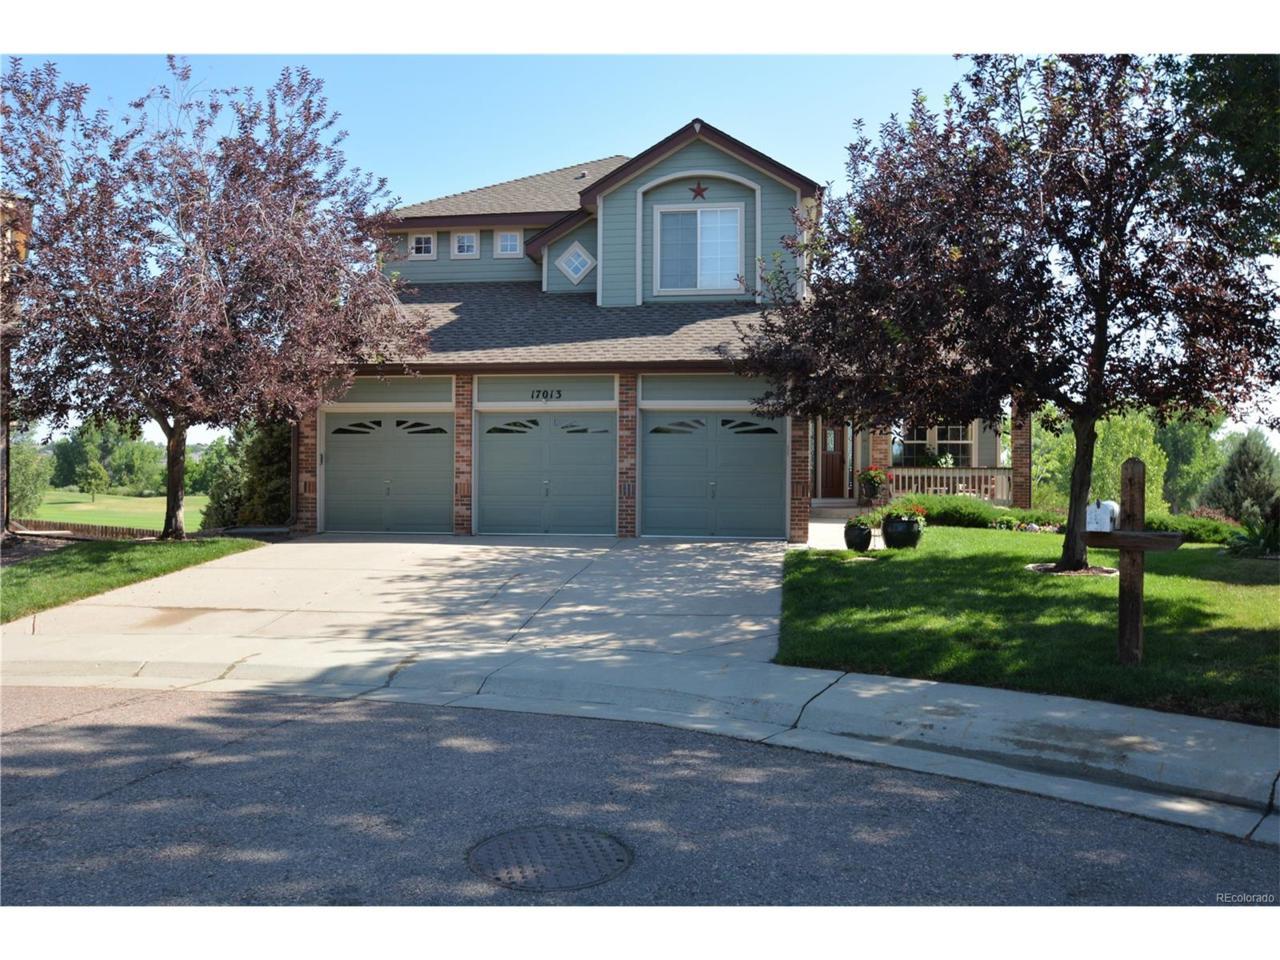 17013 W 64th Circle, Arvada, CO 80007 (MLS #9400627) :: 8z Real Estate